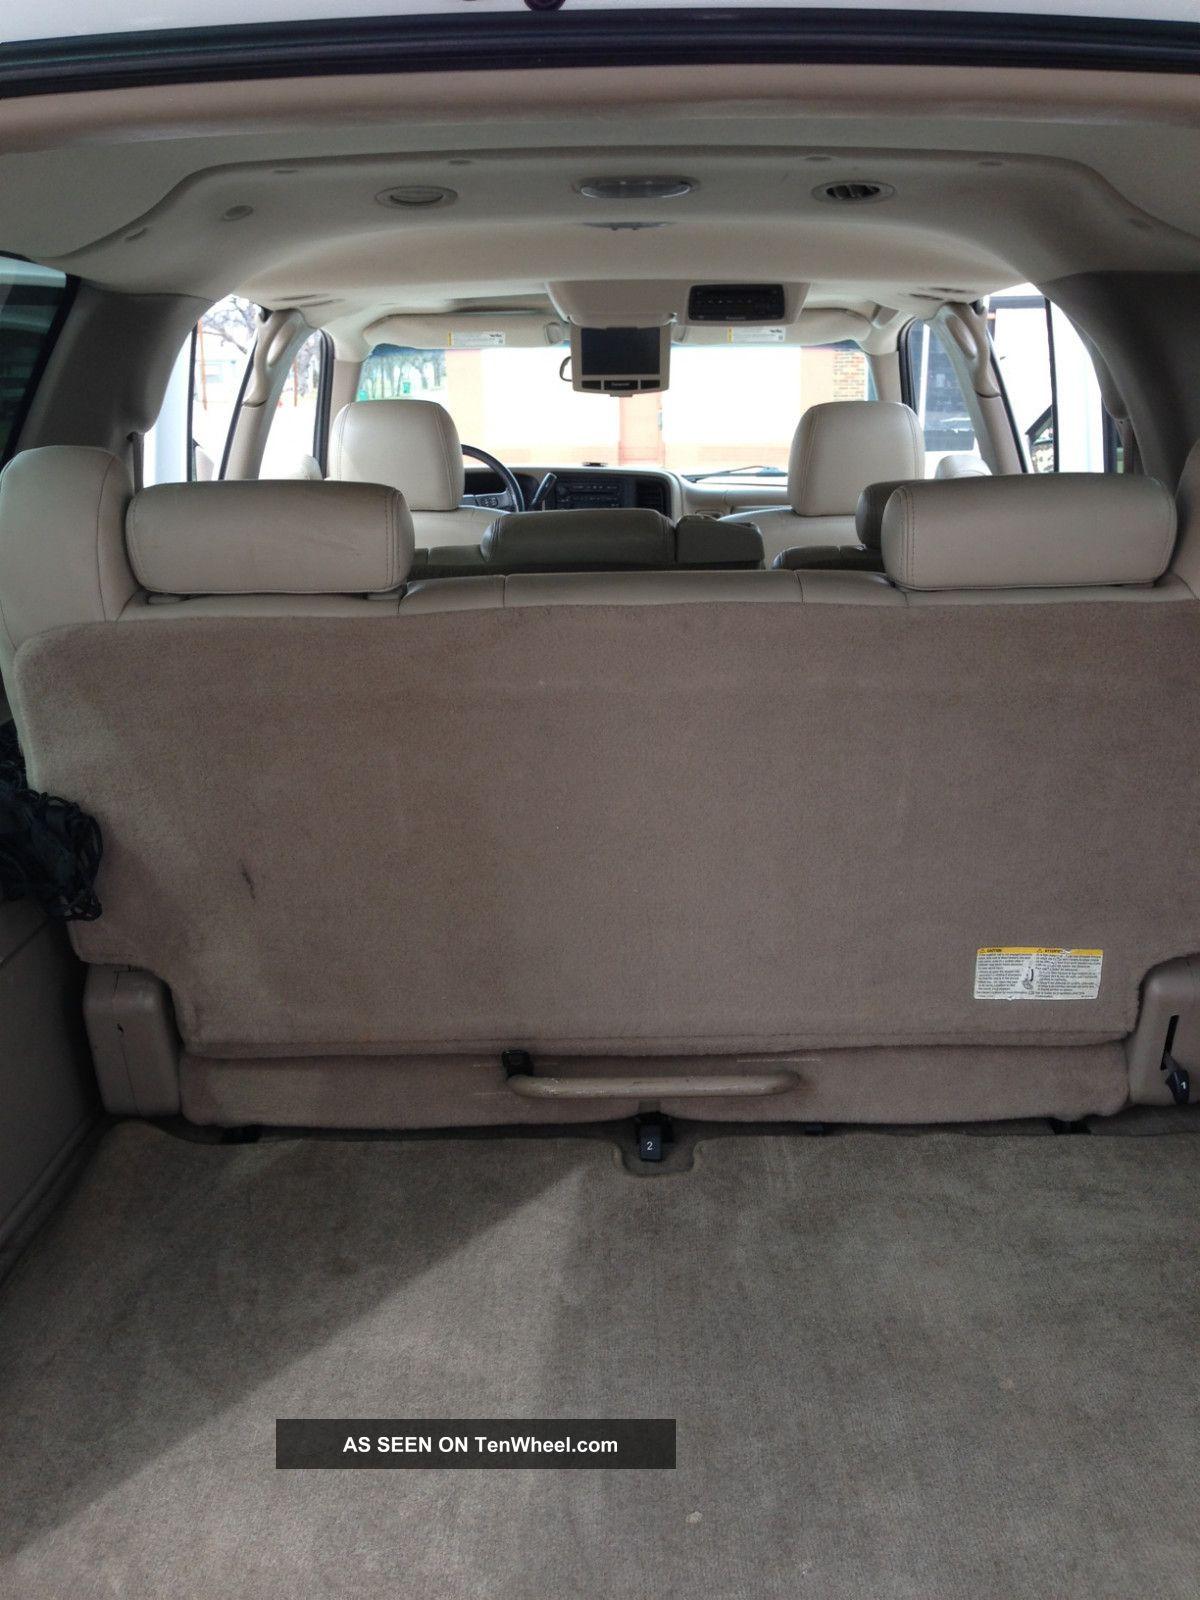 2010 ford escape user reviews msn autos weblog. Black Bedroom Furniture Sets. Home Design Ideas